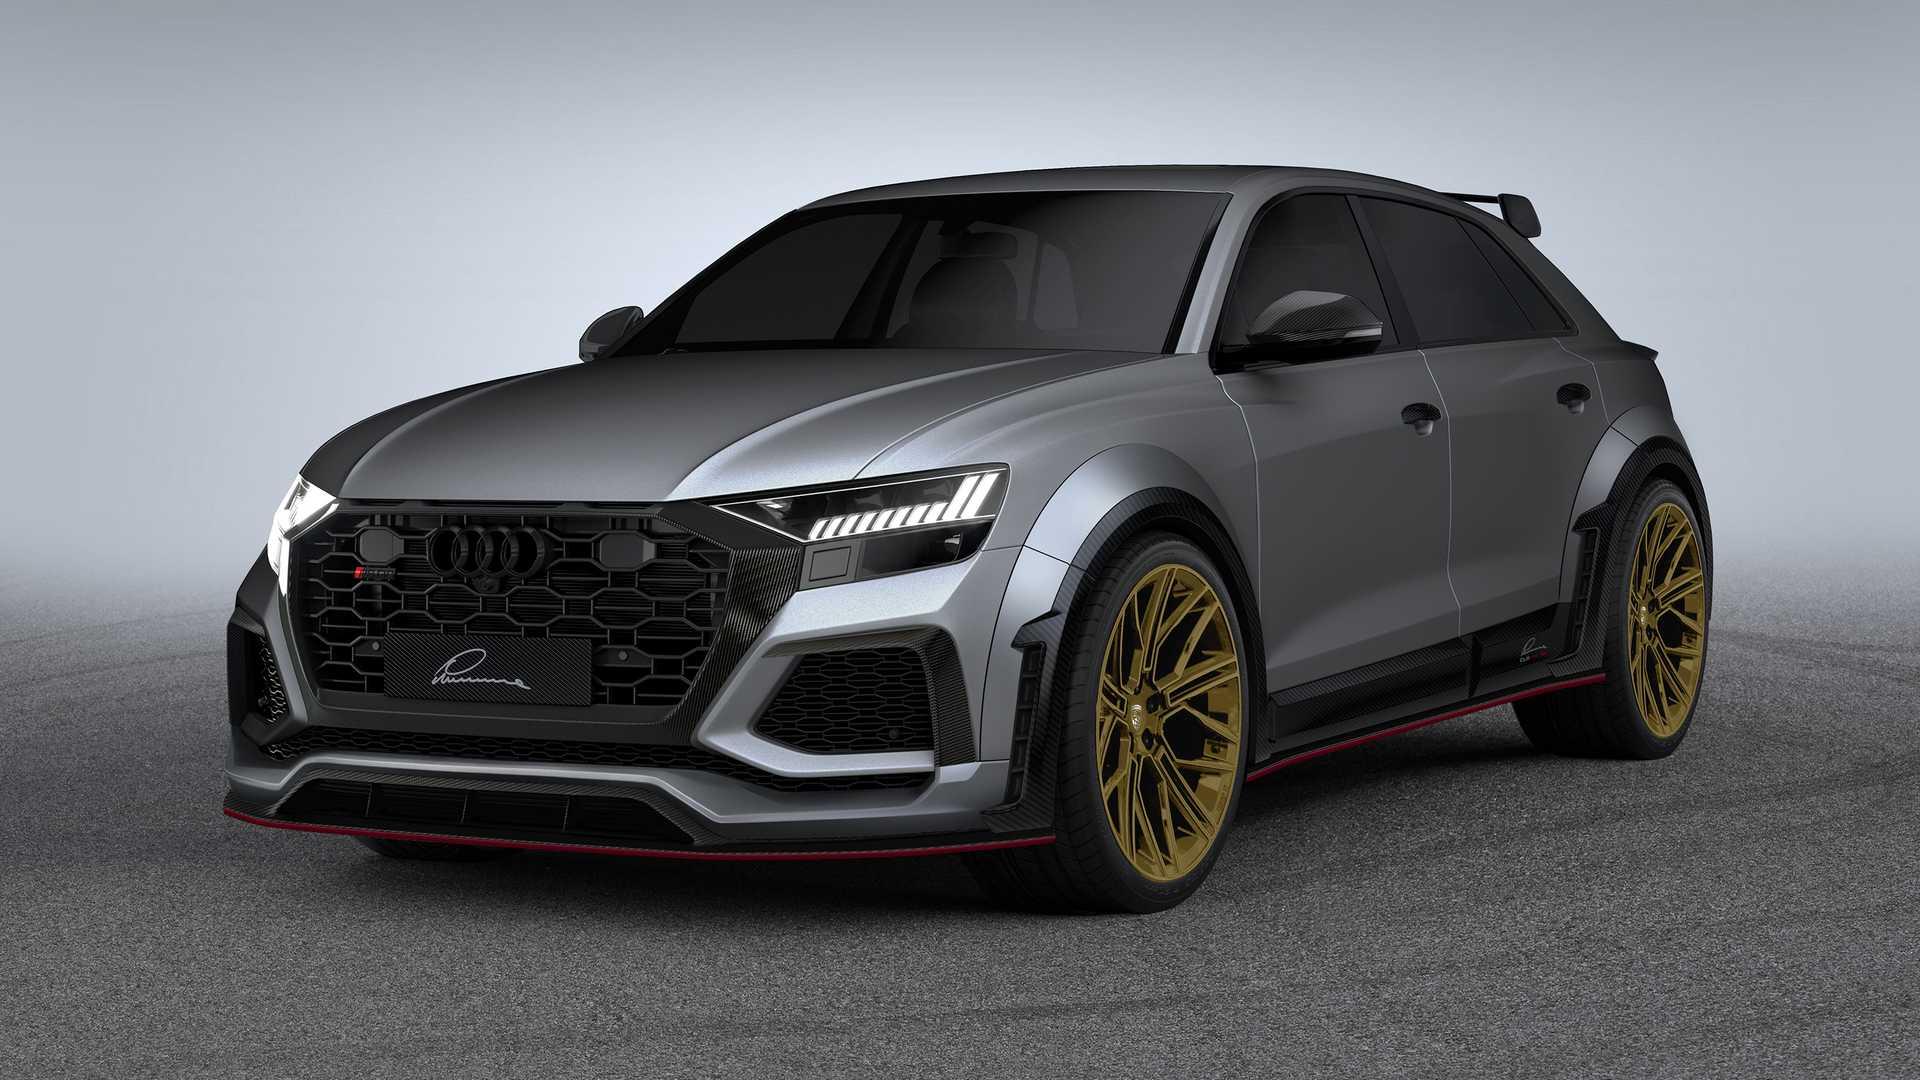 Audi-RS-Q8-CLR-8-RS-By-Lumma-Design-2